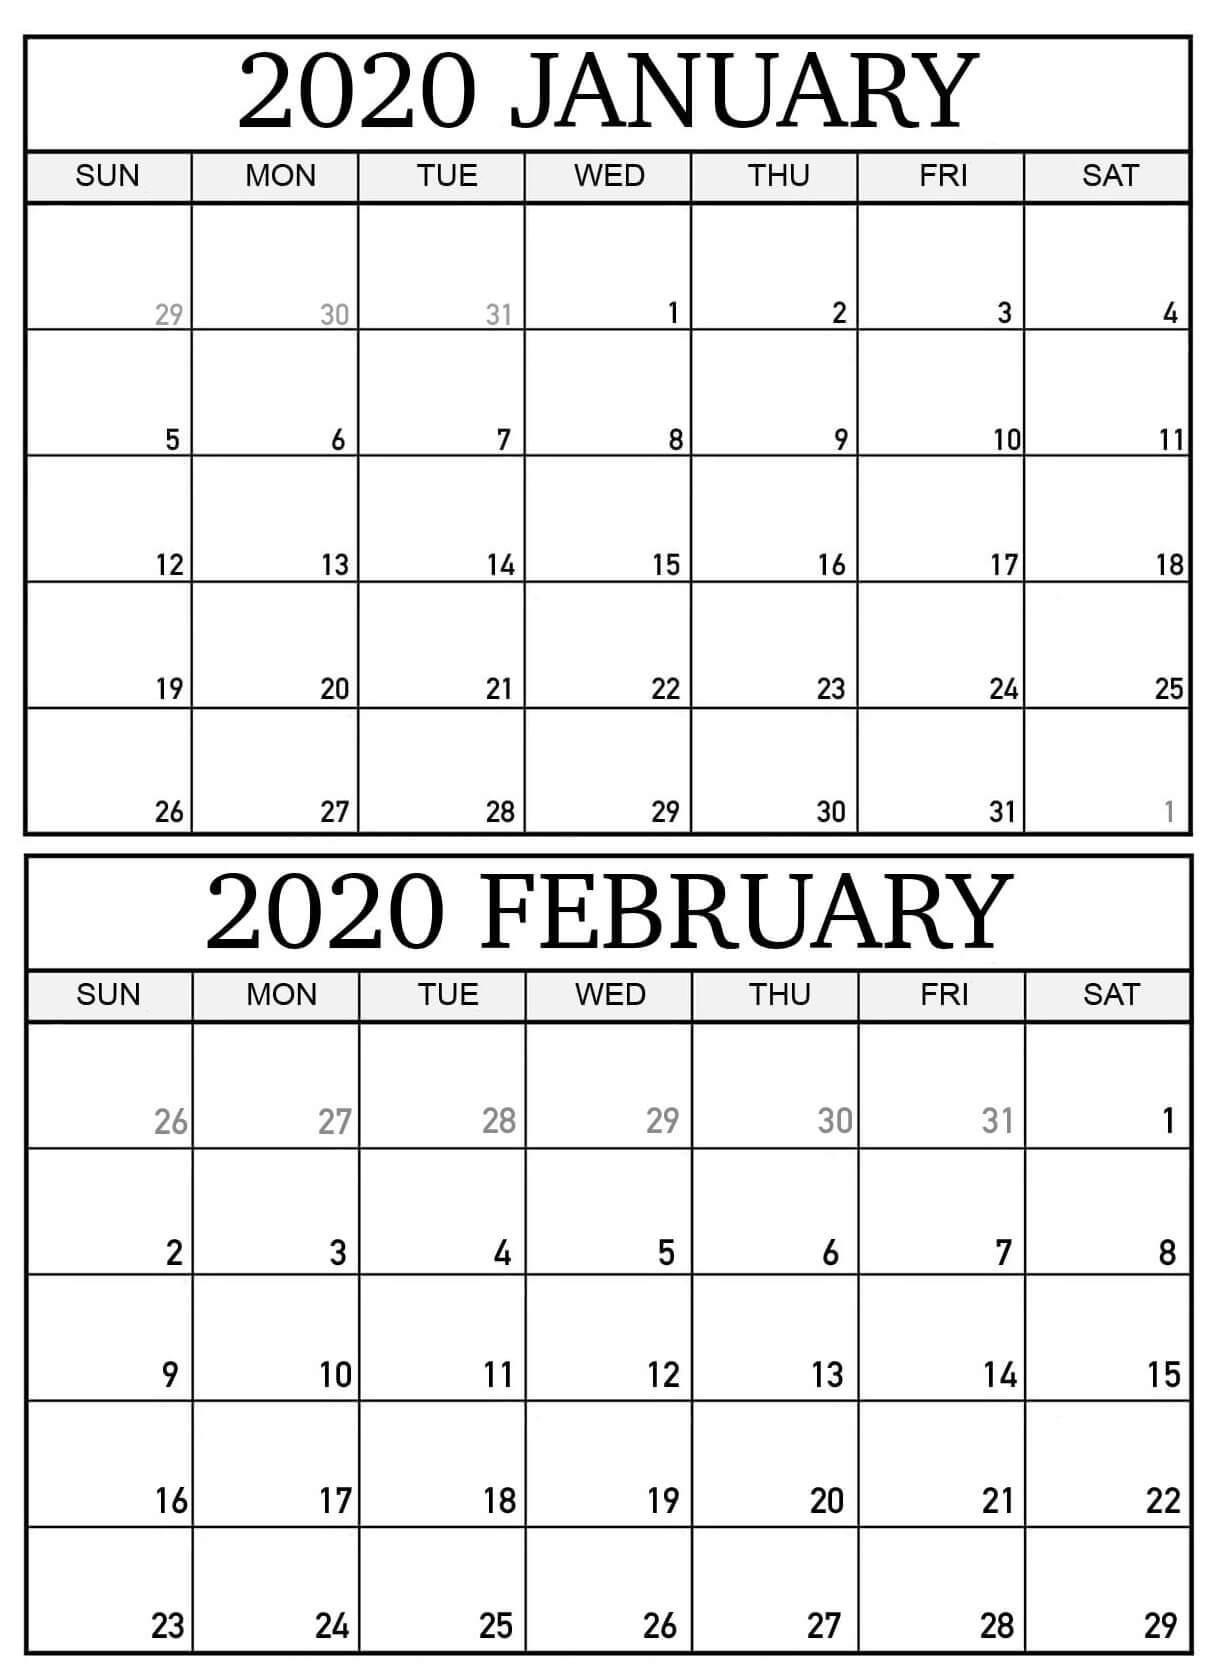 Blank 2020 January February Calendar Word - 2019 Calendars